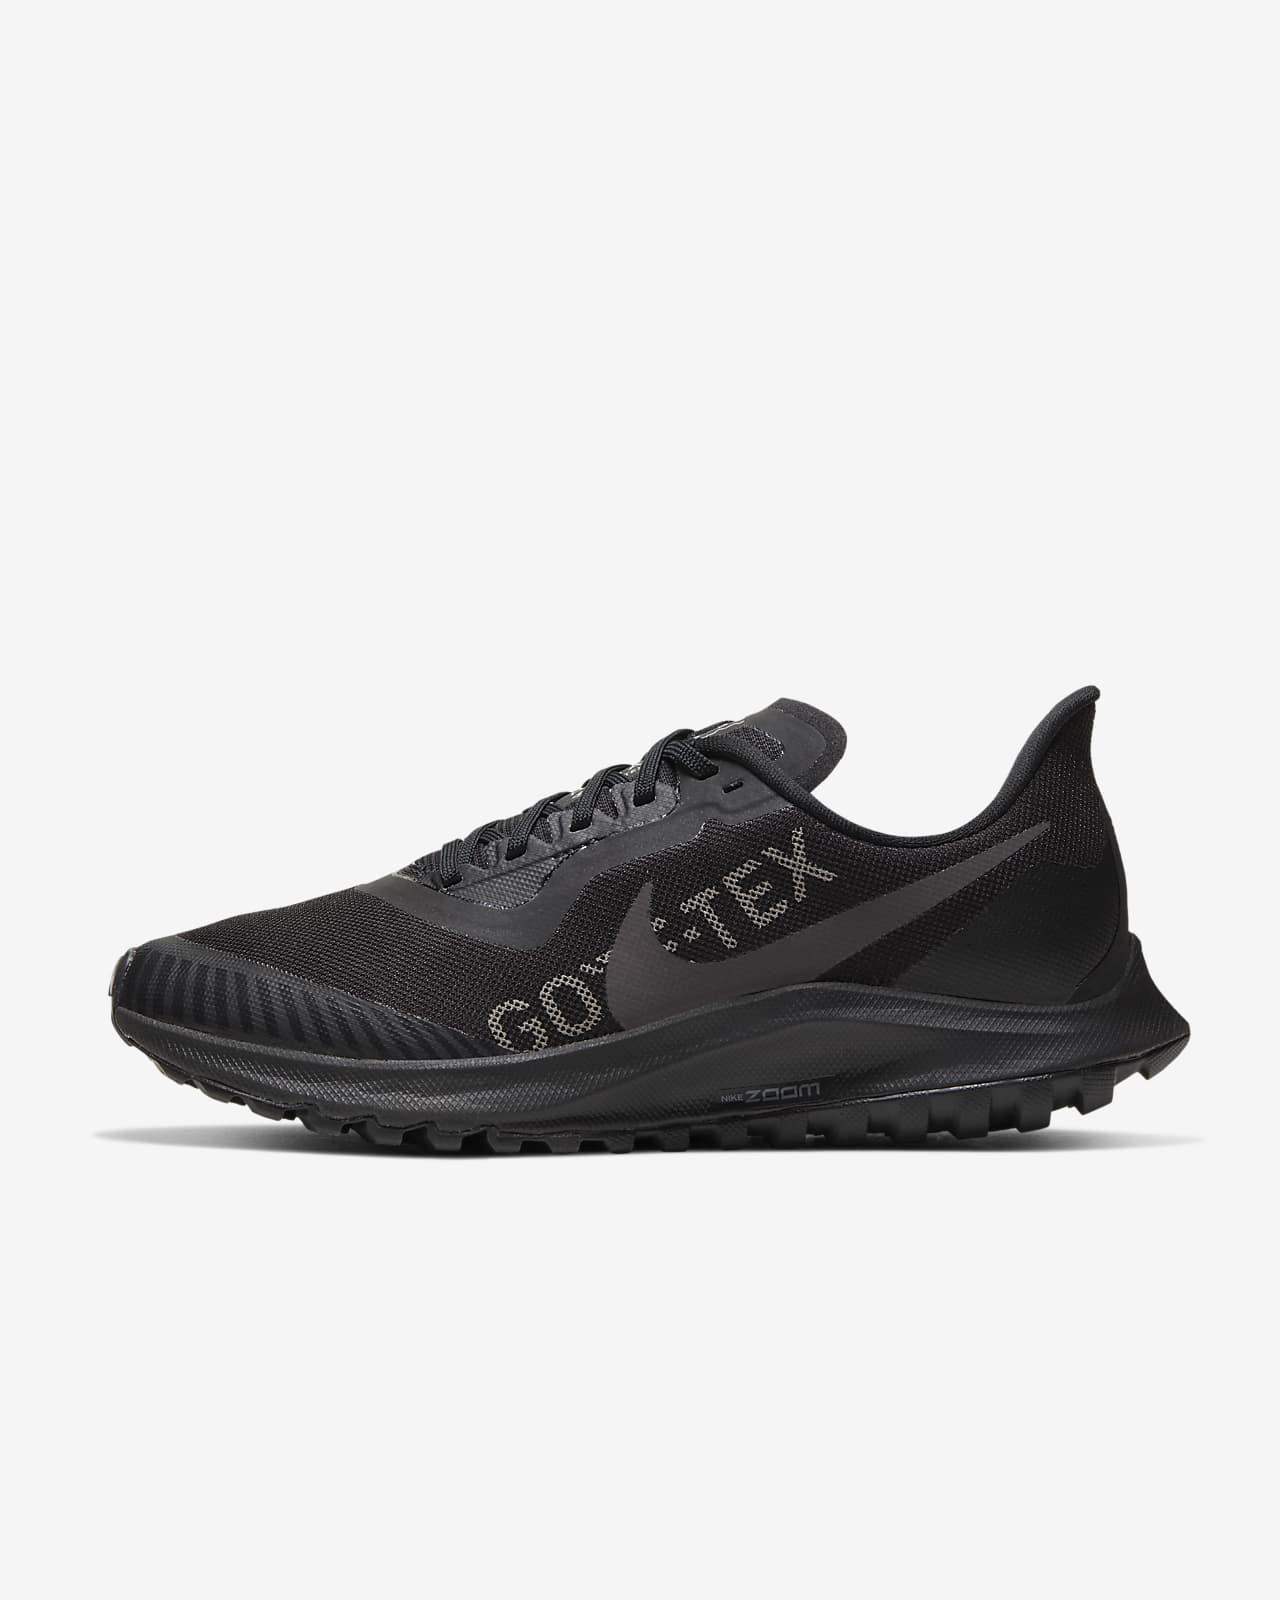 Nike Zoom Pegasus 36 Trail GORE-TEX Women's Trail Running Shoe